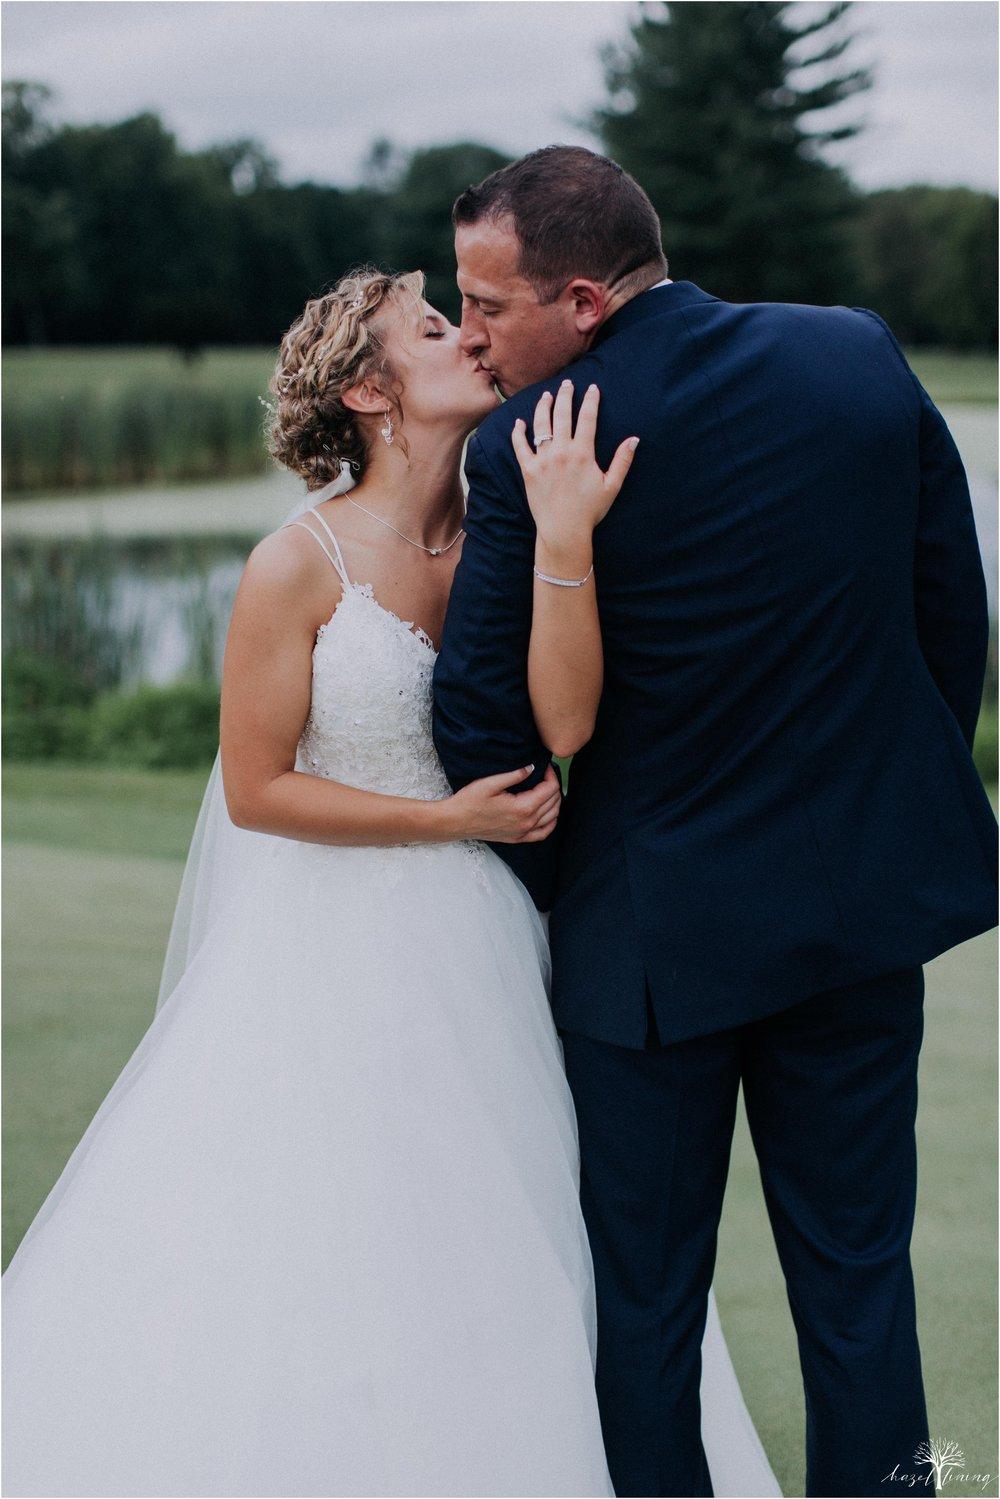 jonathan-weibel-becky-haywood-loft-at-sweetwater-cc-pennsburg-pennsylvania-rainy-day-summer-wedding-hazel-lining-travel-wedding-elopement-photography_0093.jpg